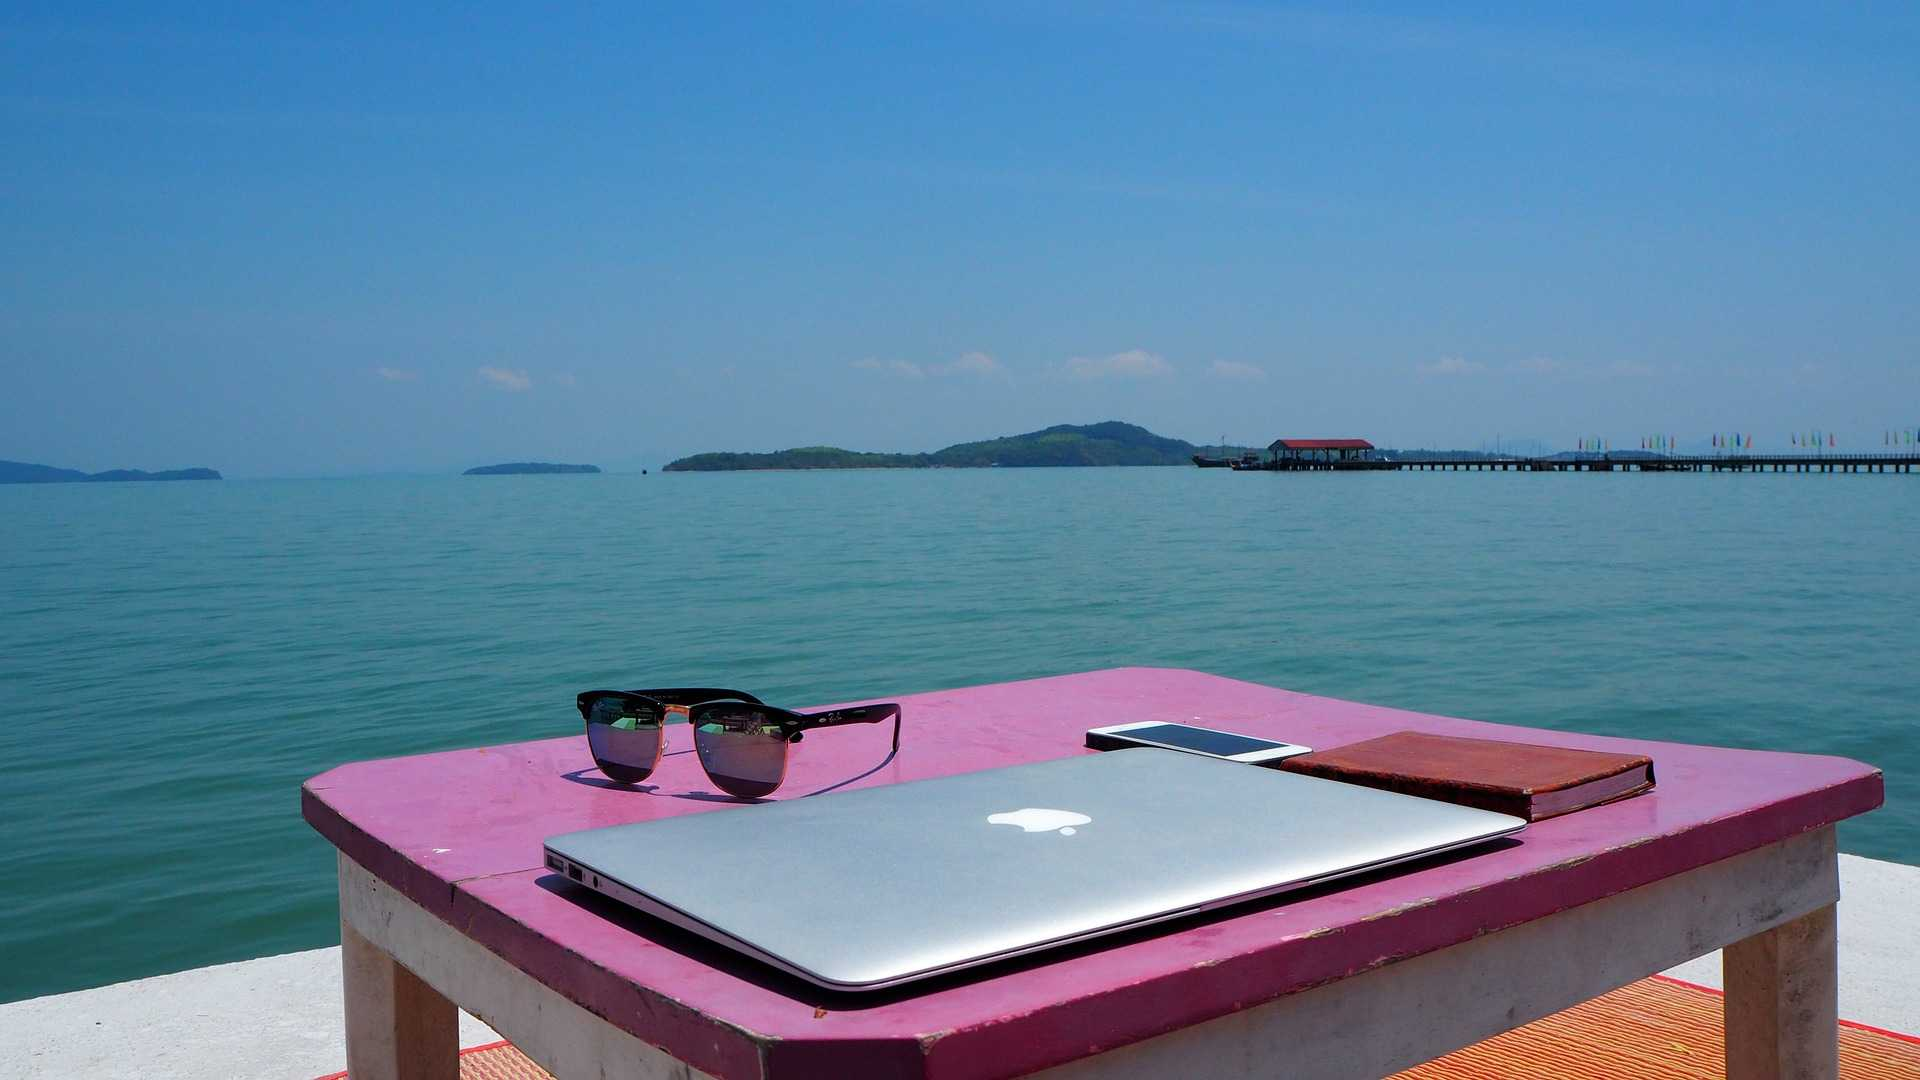 dream remote job on the beach